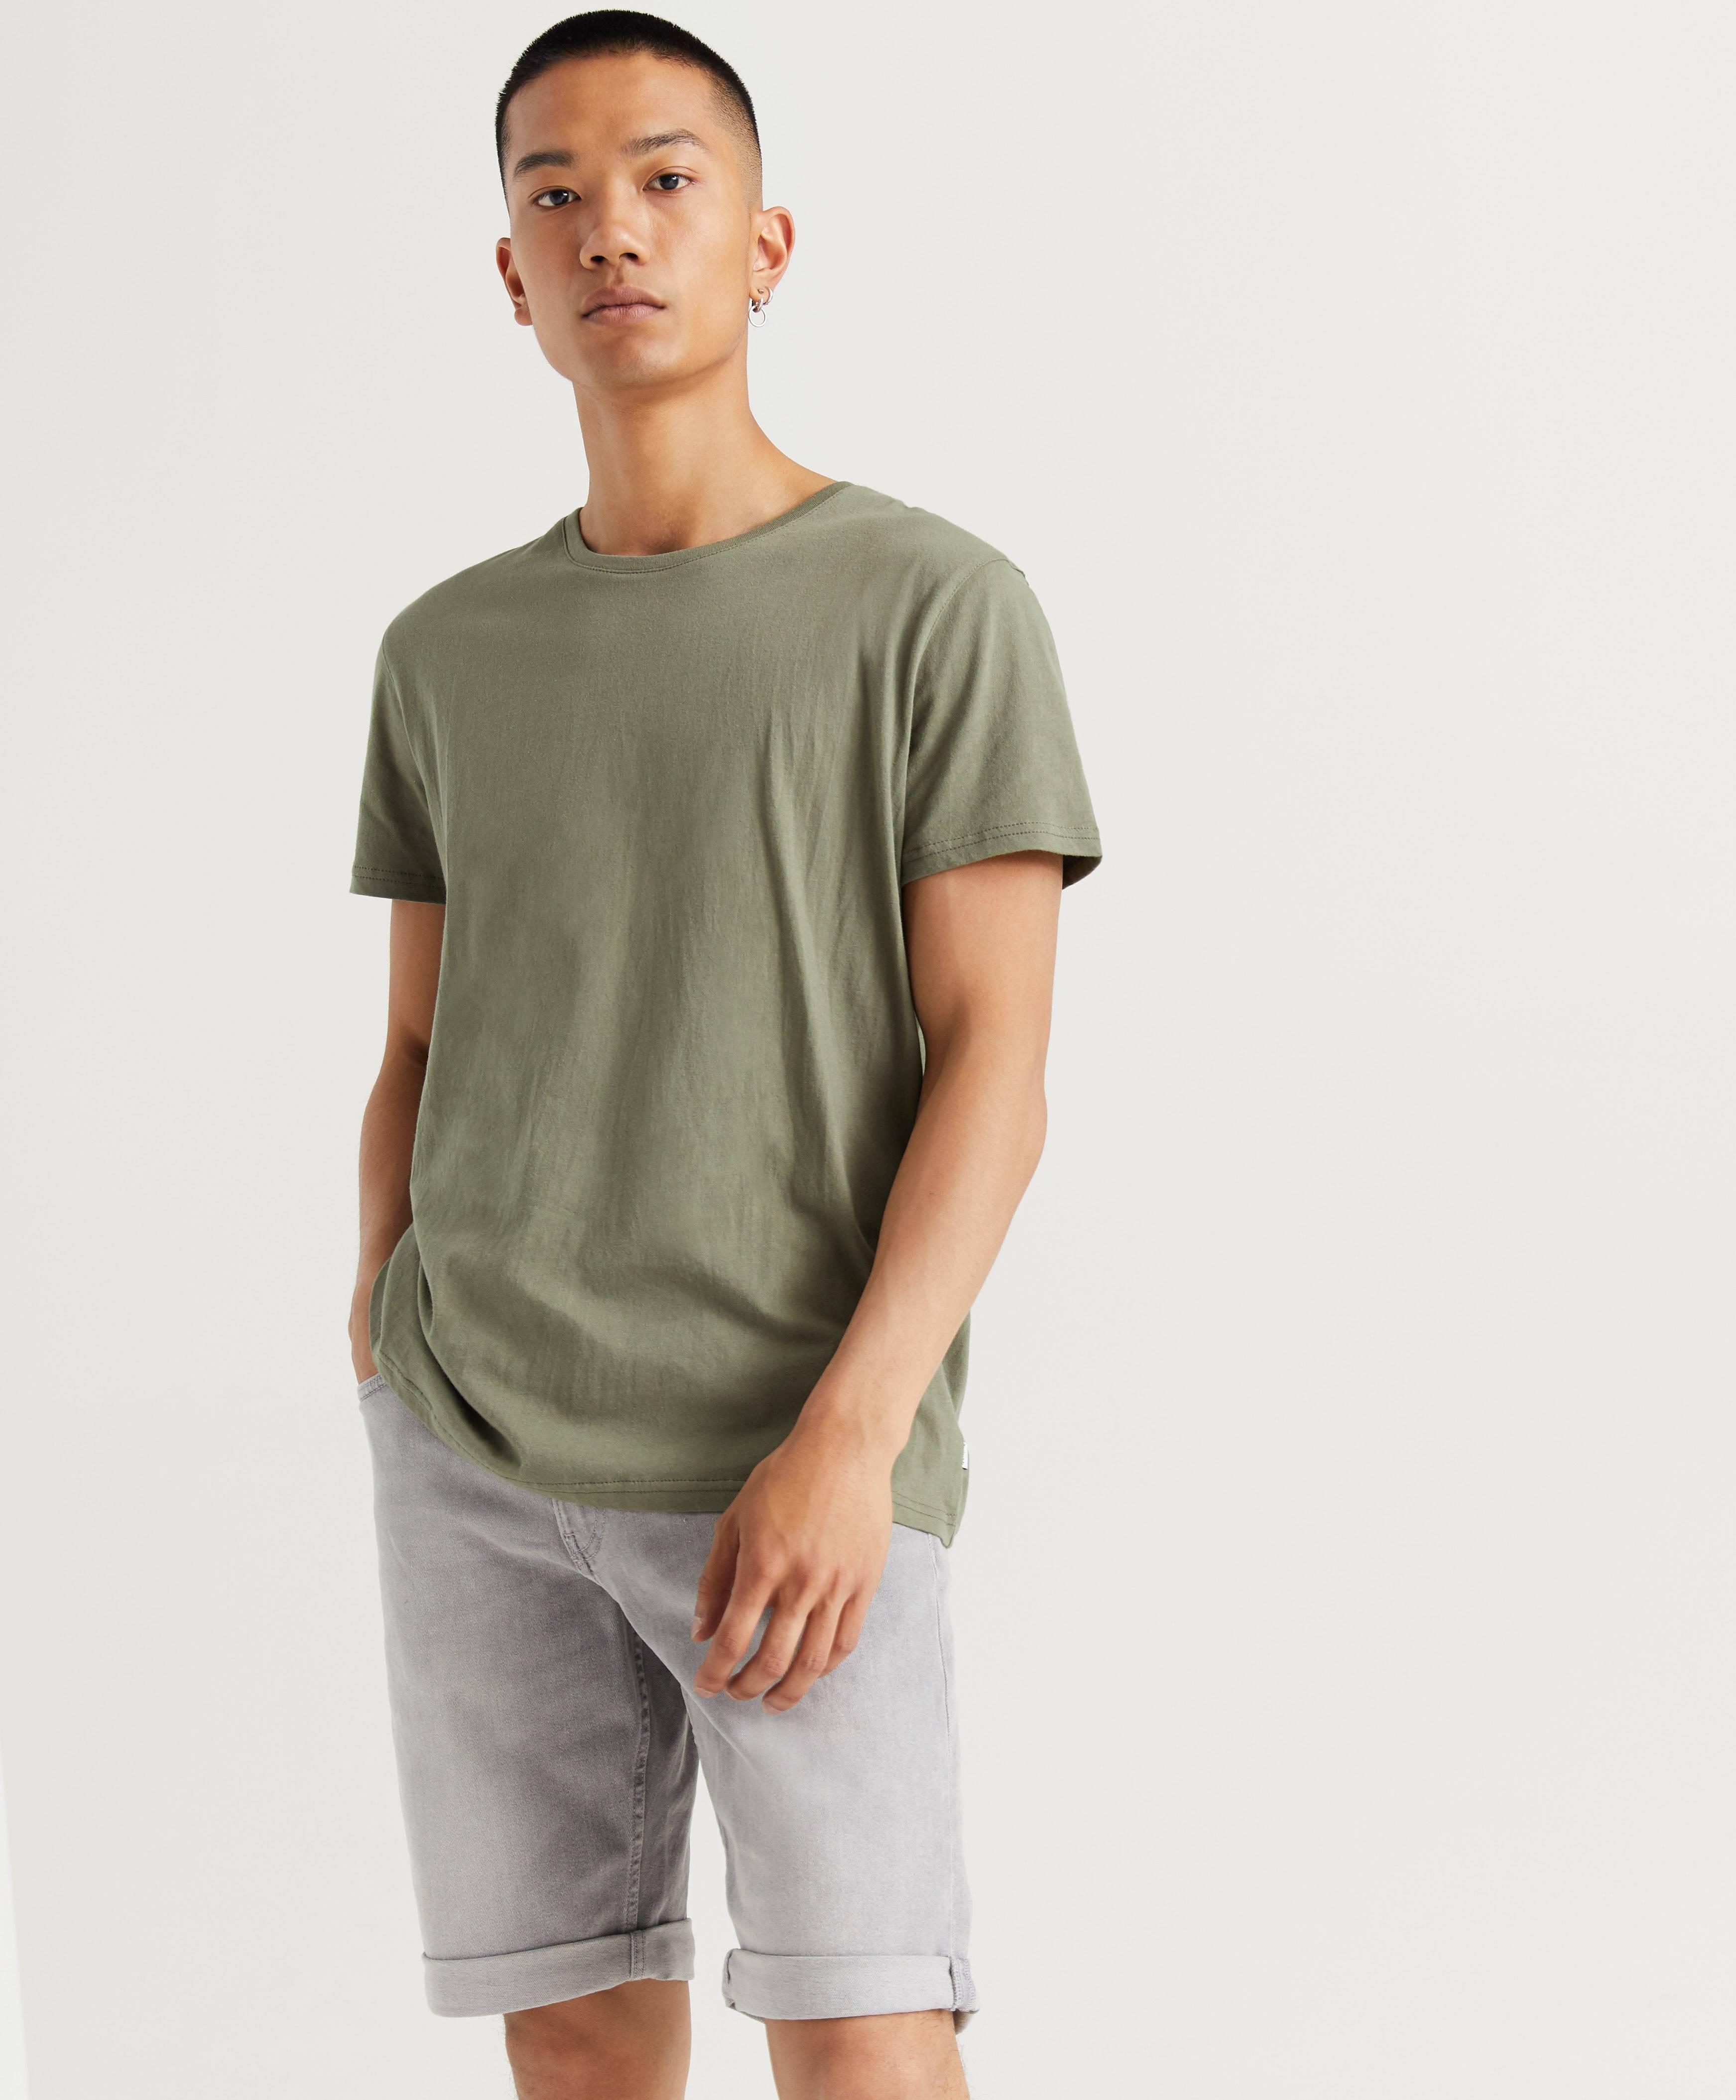 Resteröds T-shirt Original R-neck Tee Grön